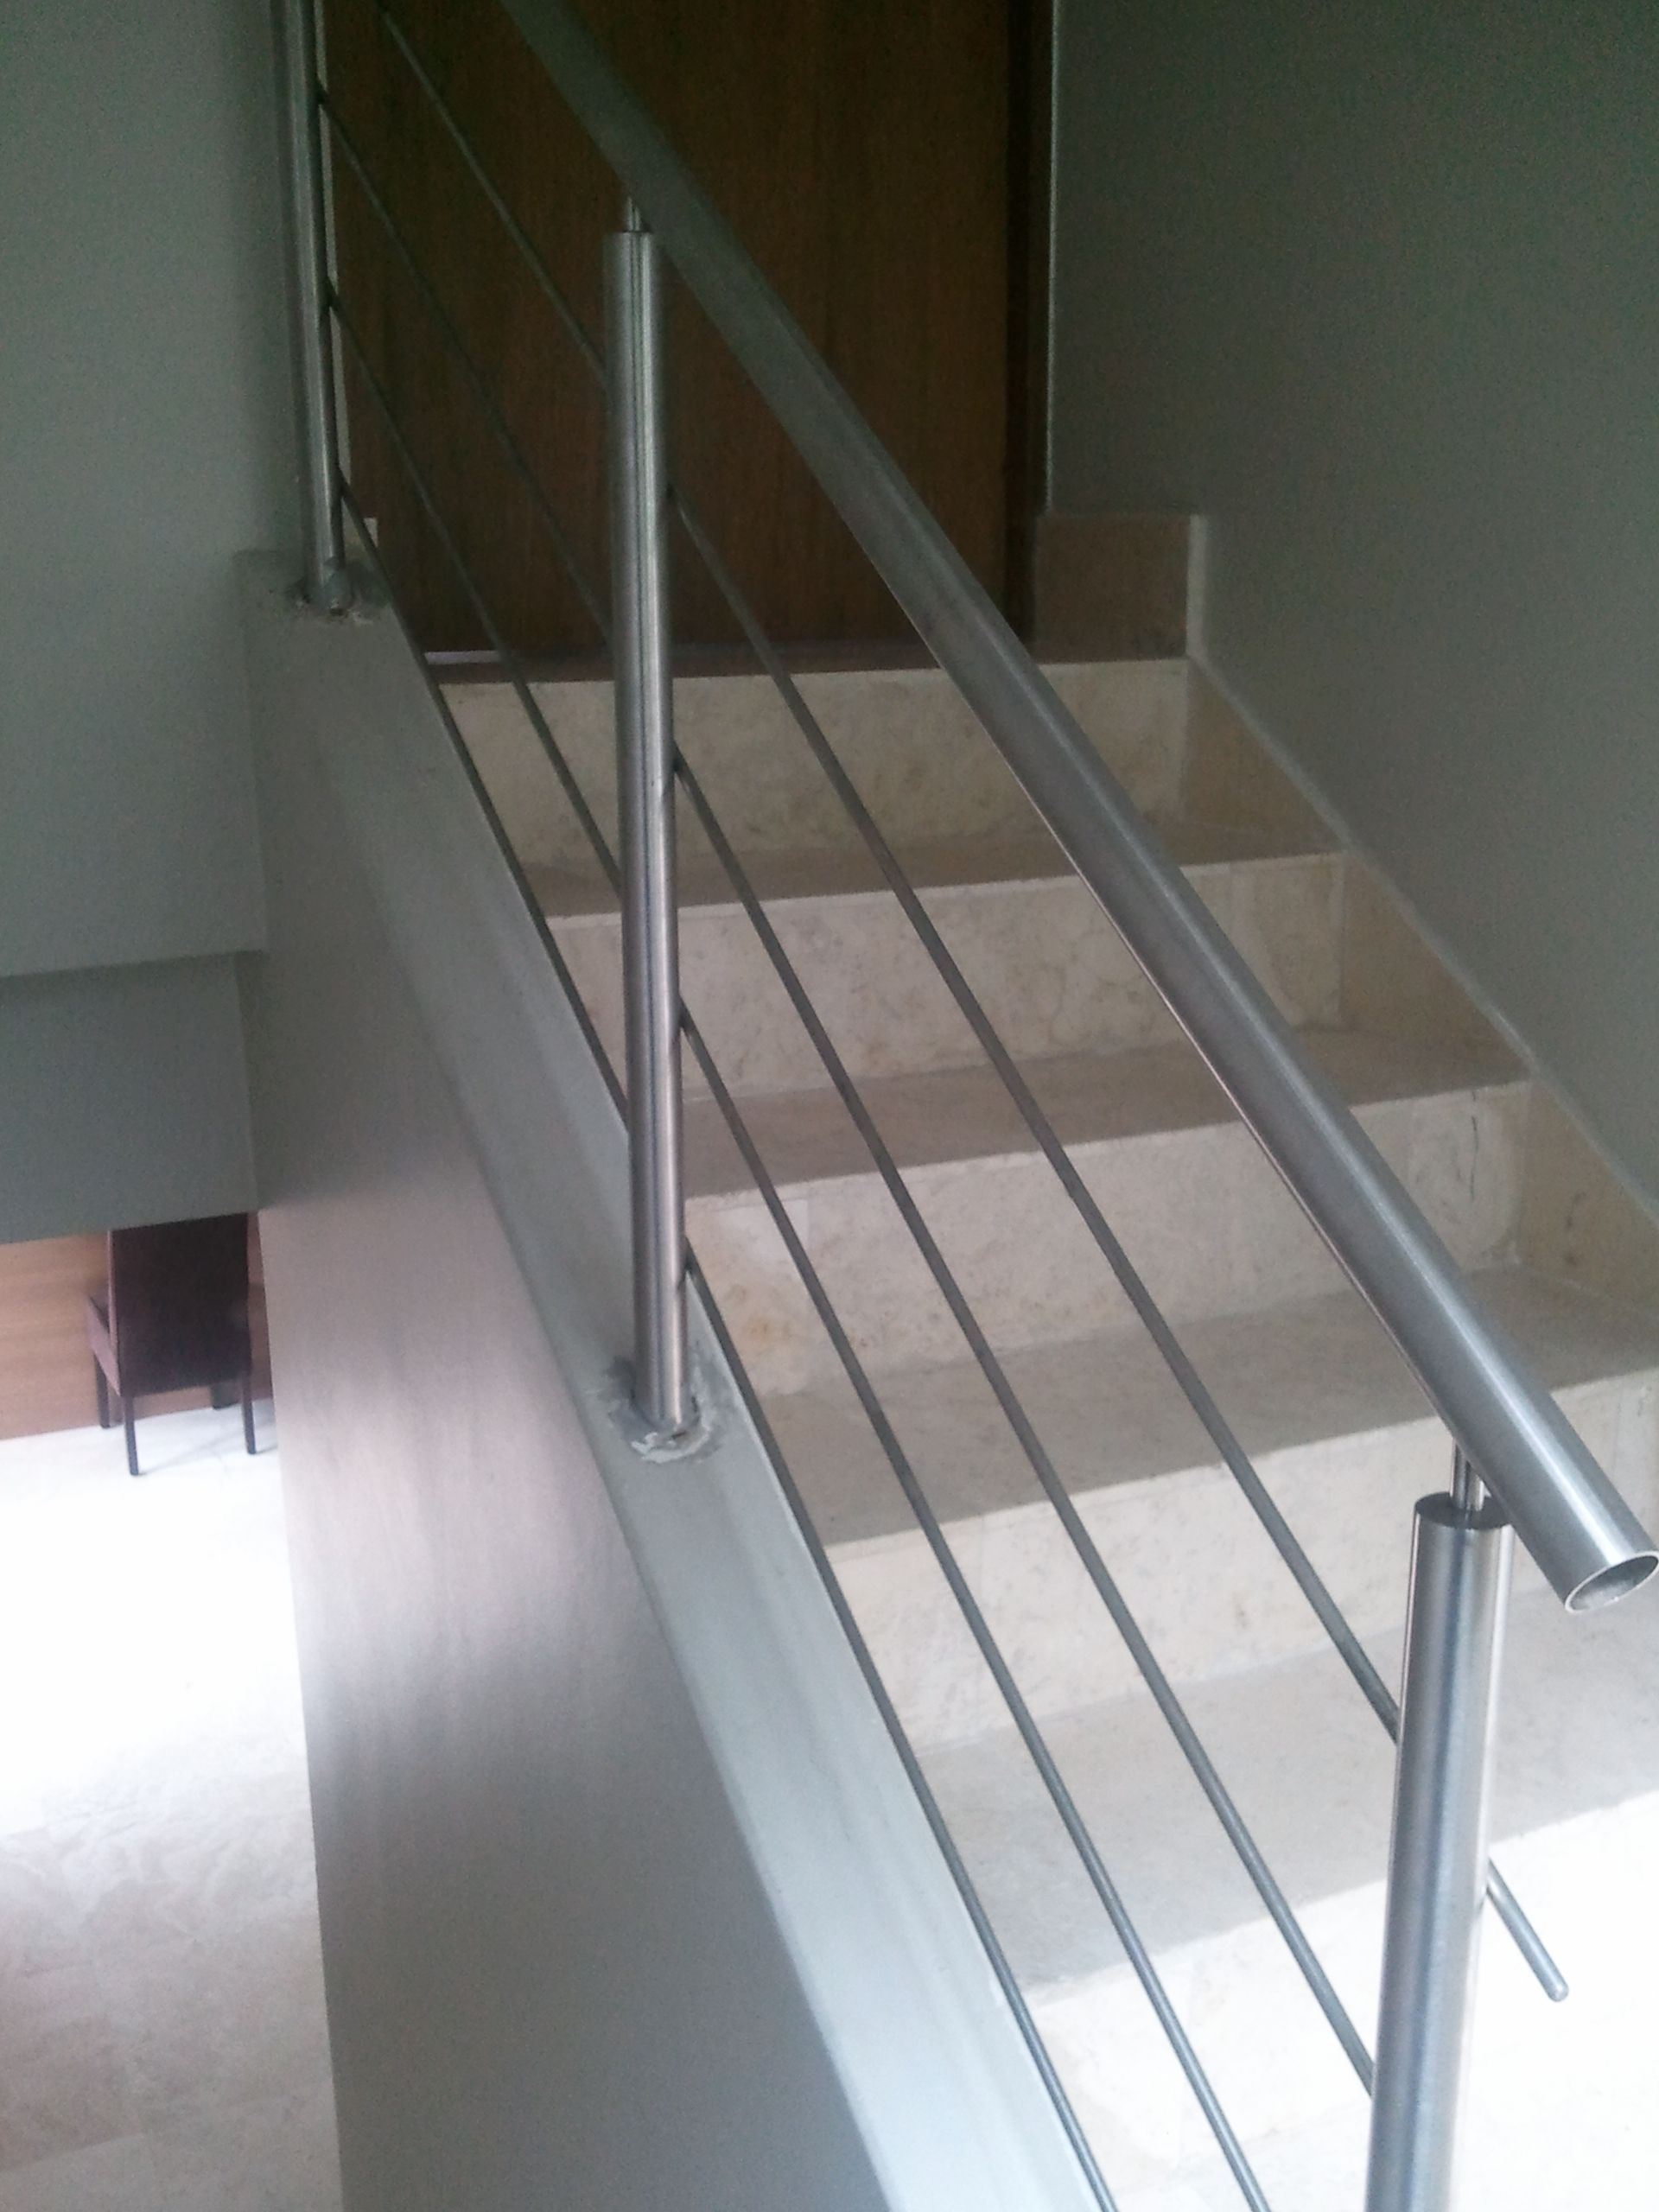 Altezza Dei Parapetti pin on barandas, railings